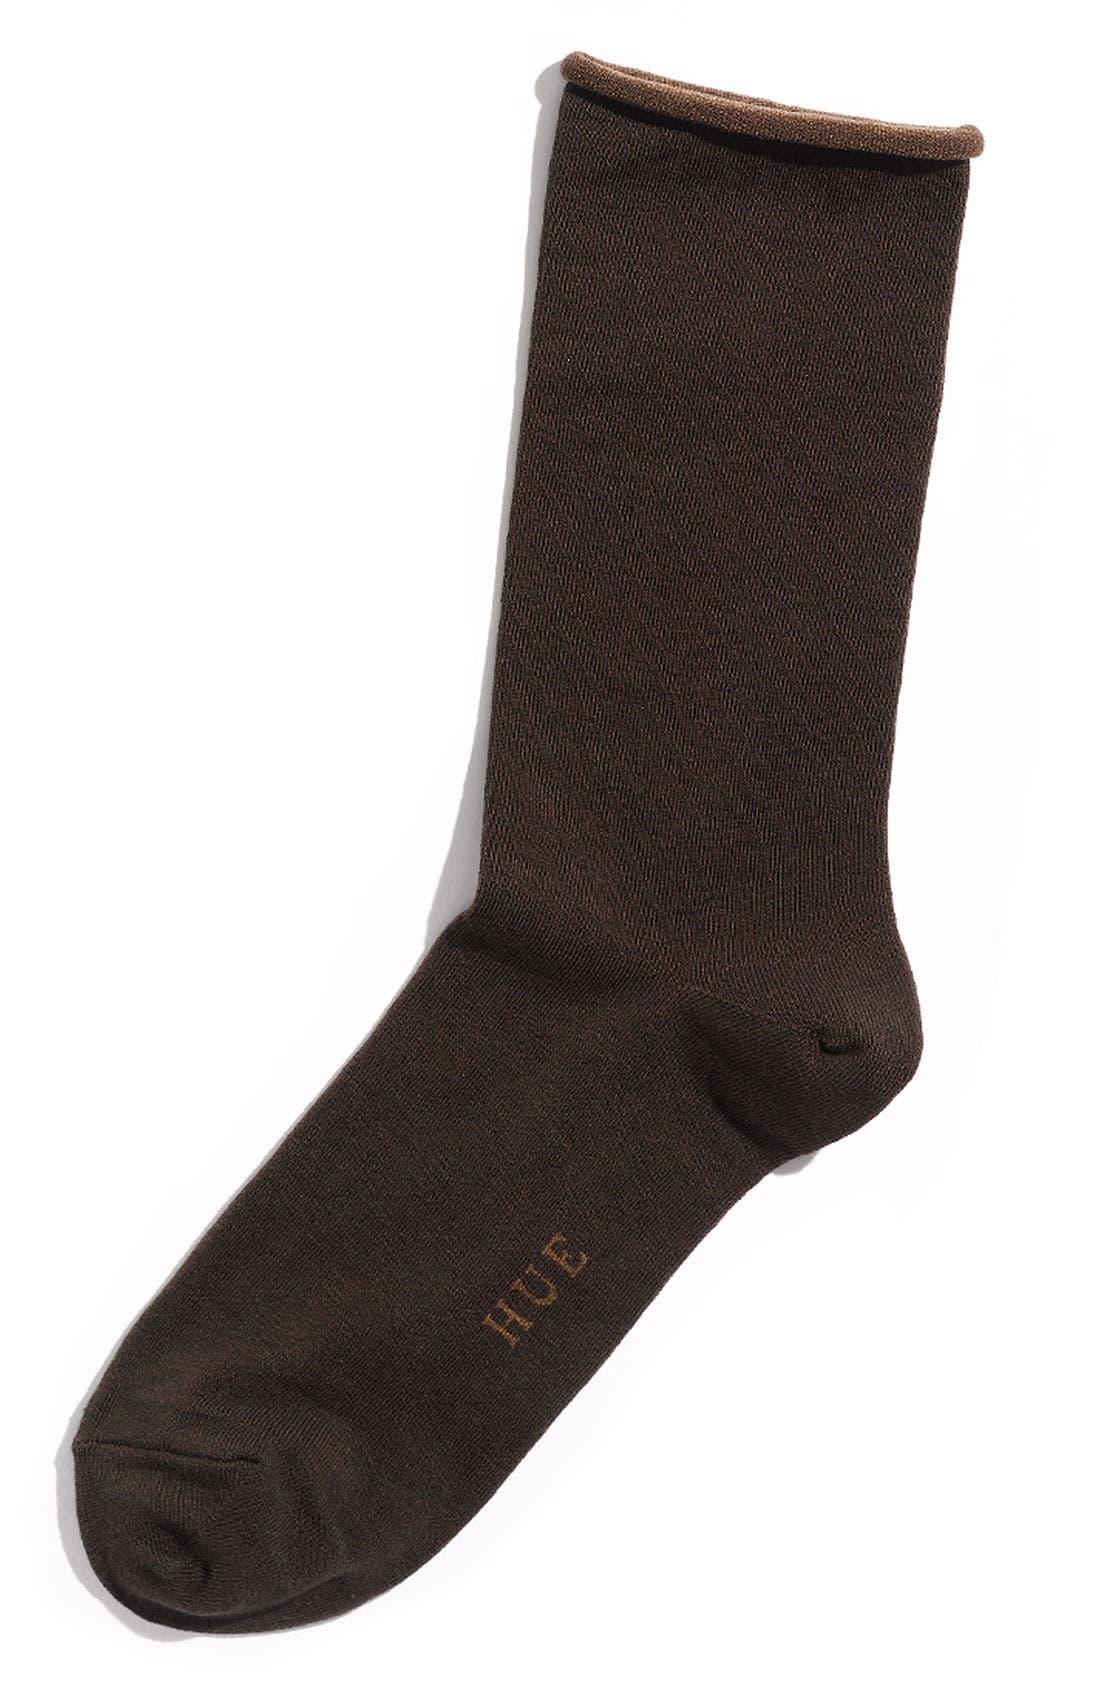 'Jeans' Socks,                         Main,                         color, Espresso